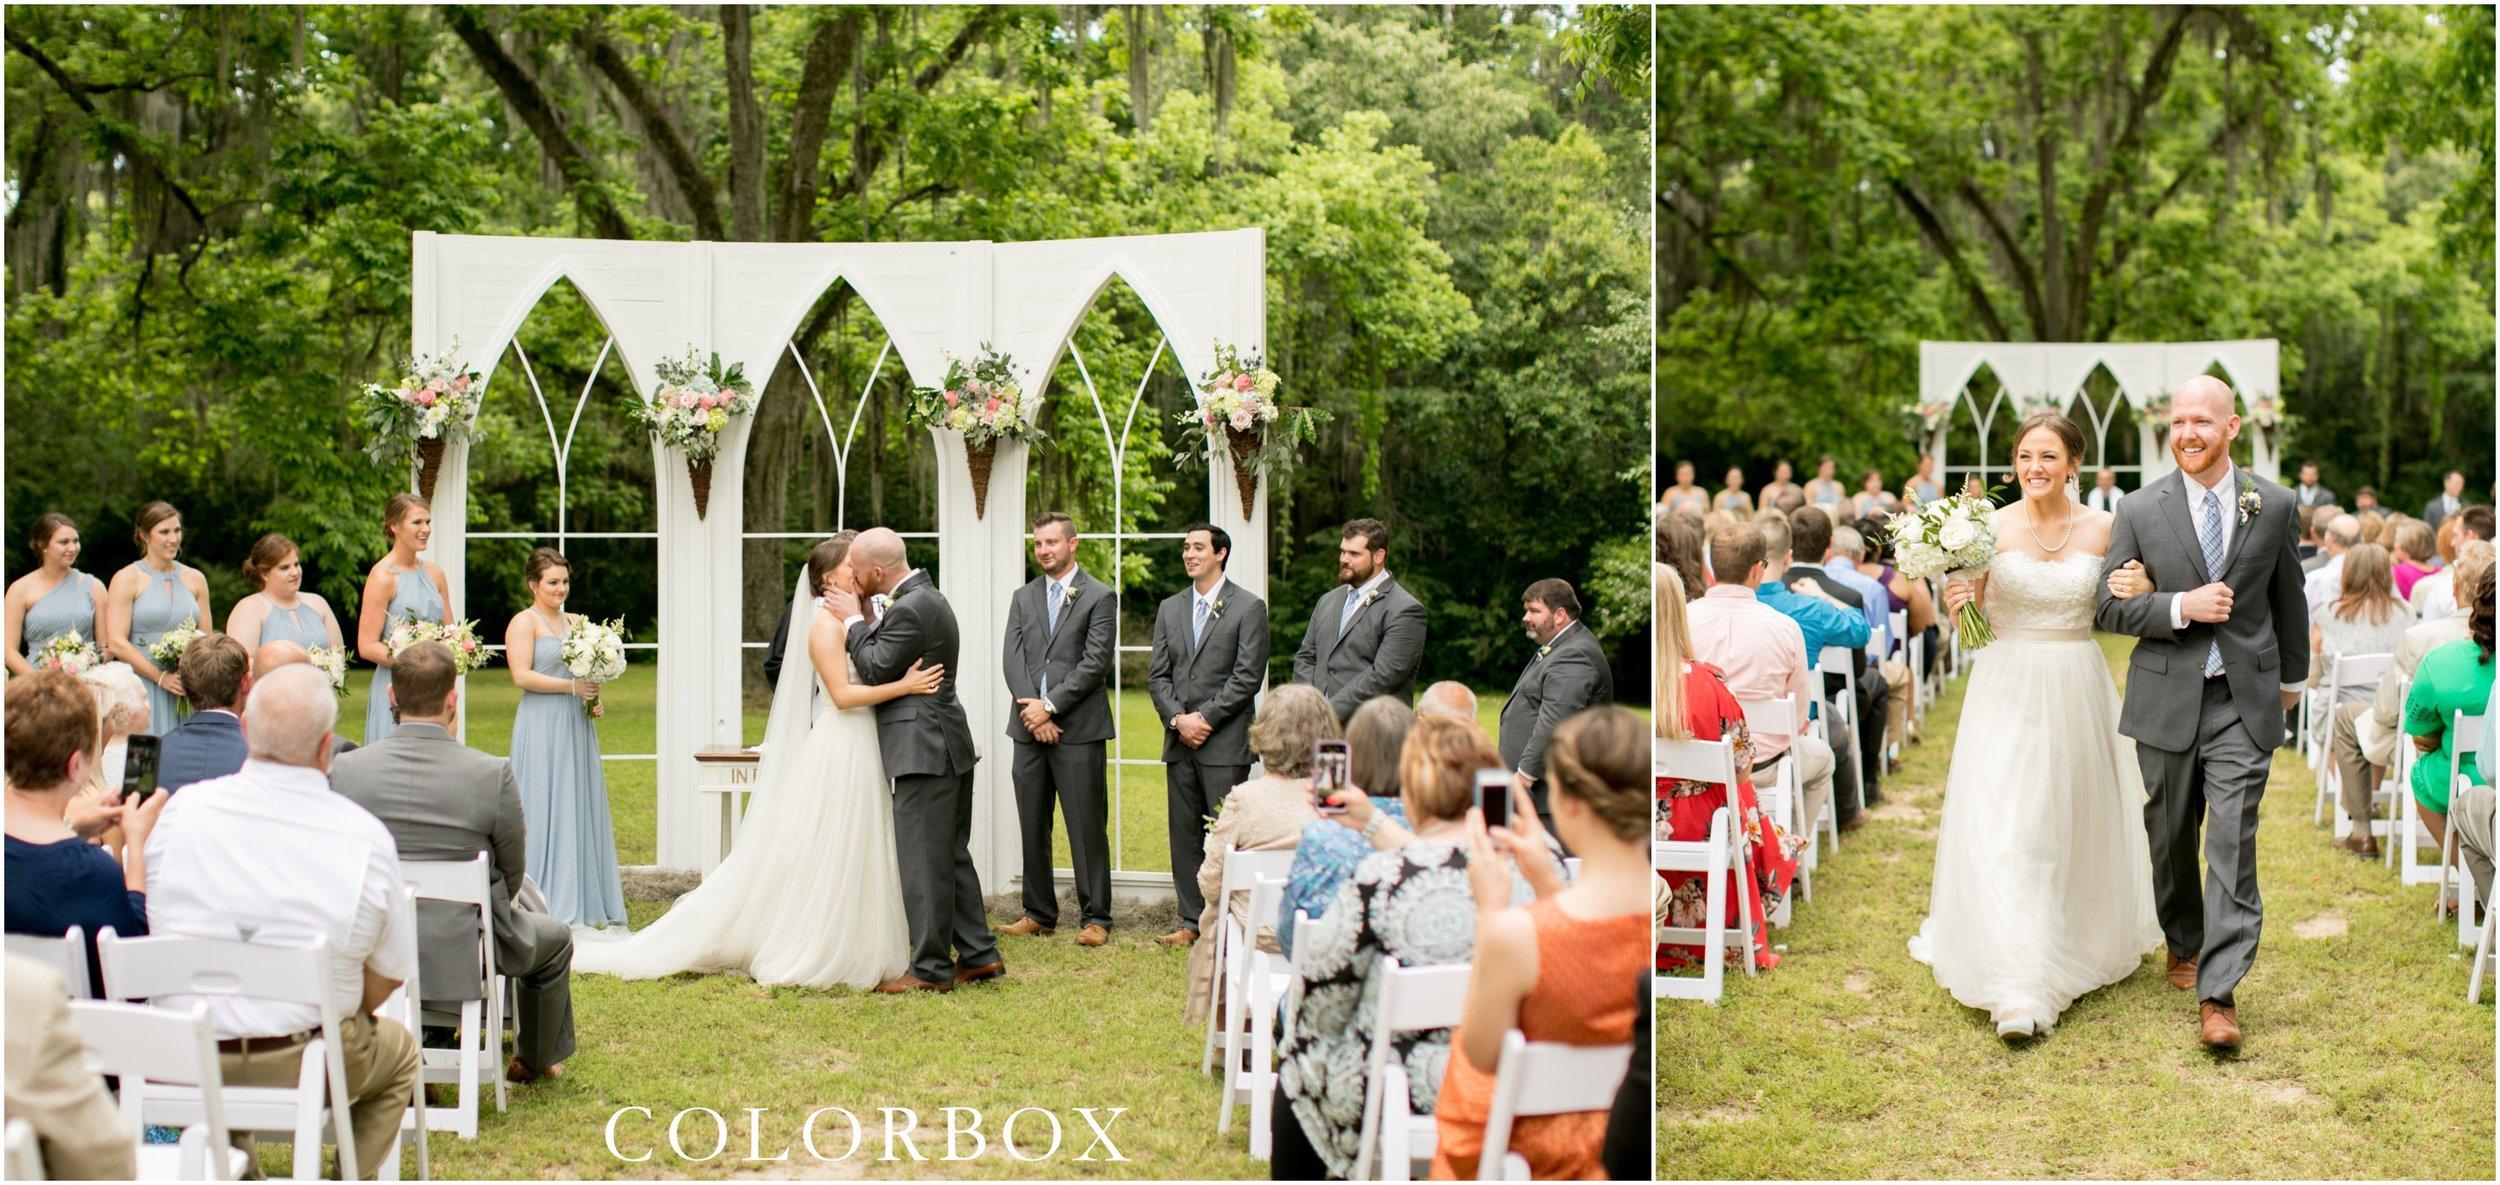 colorboxphotographers_5930.jpg